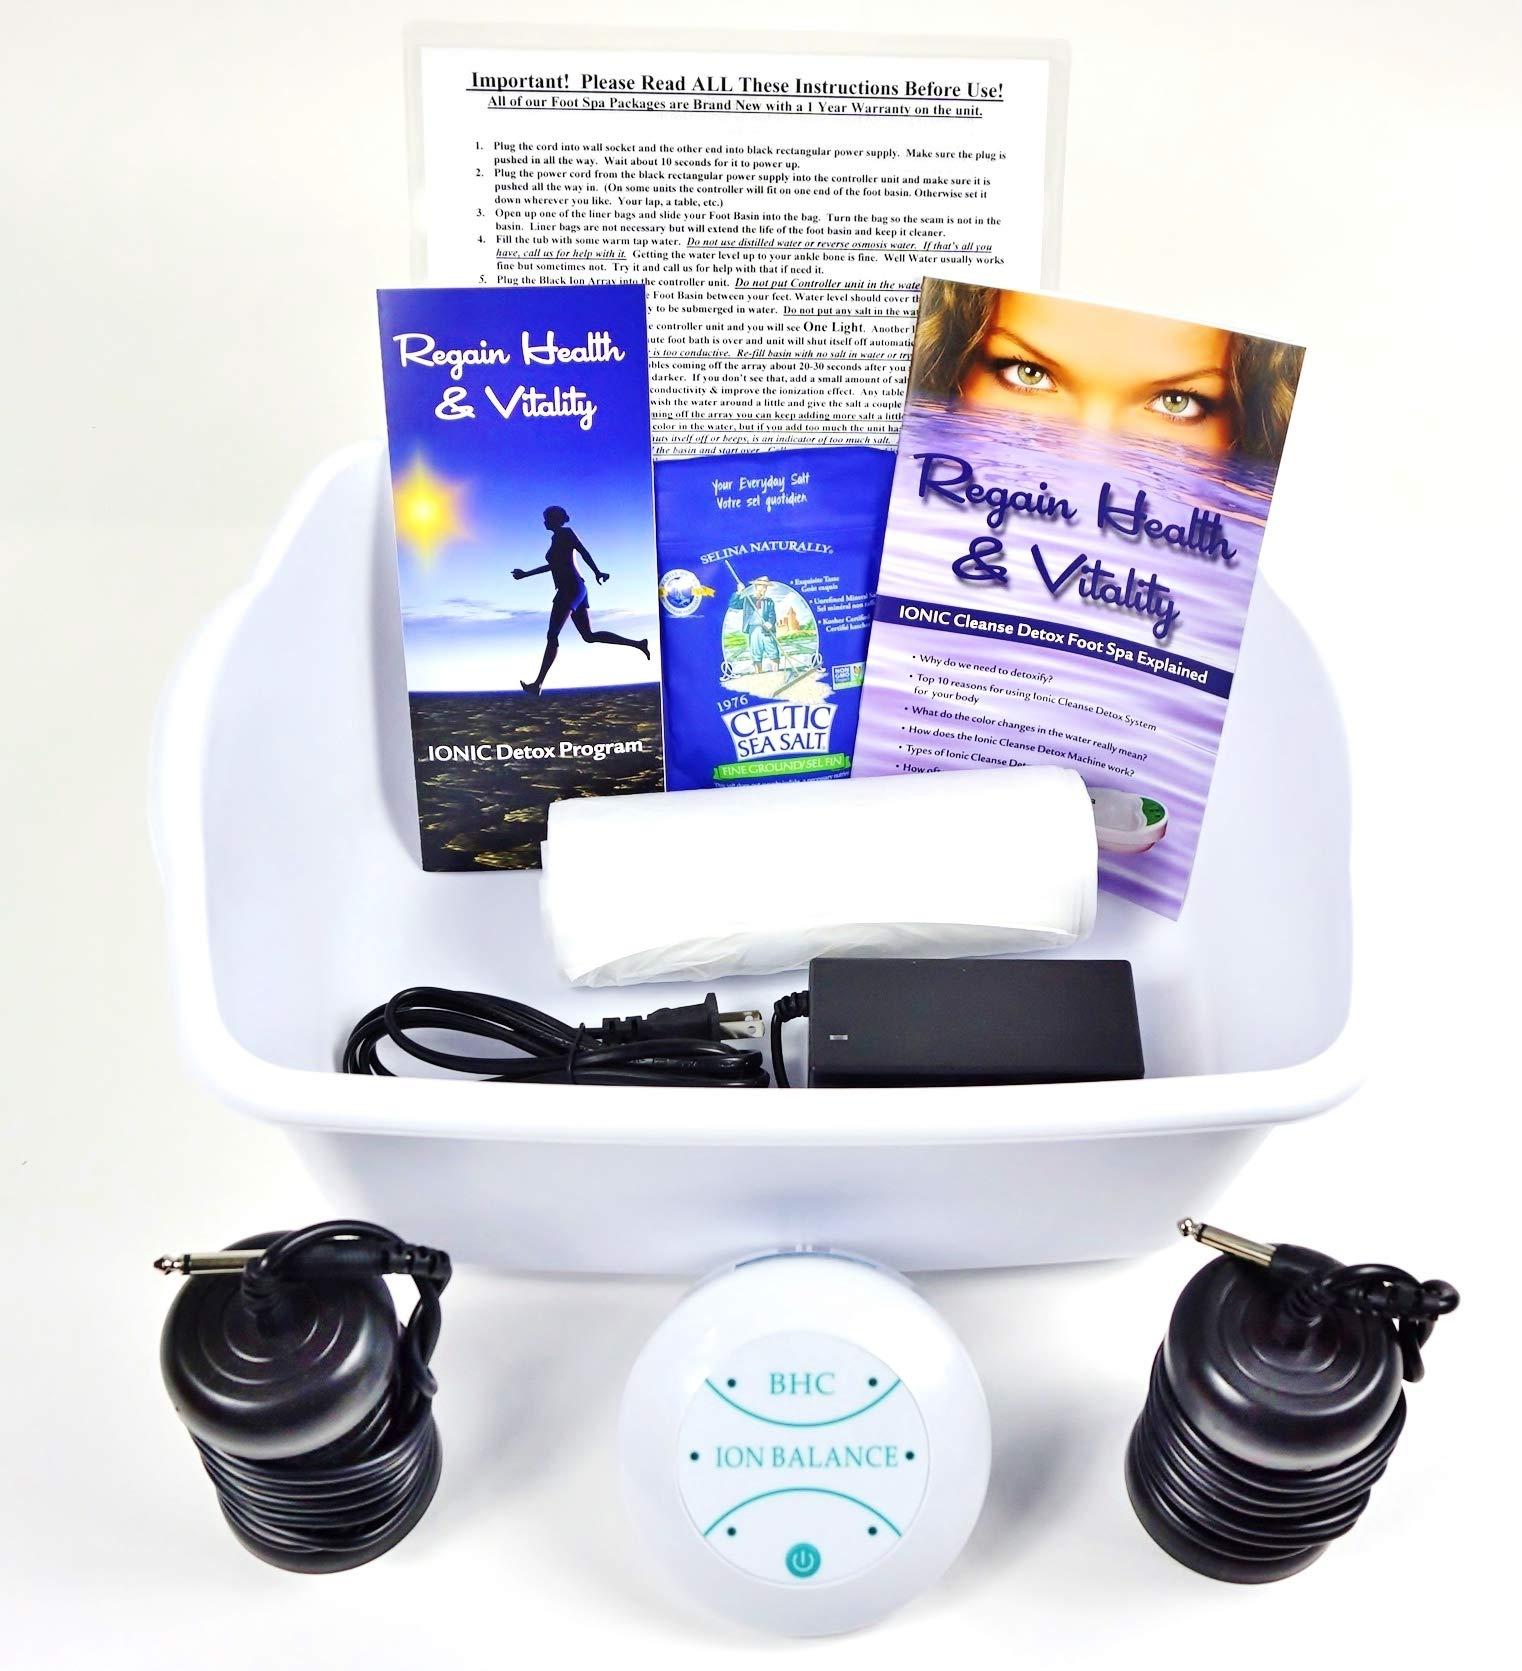 Cleanse Machine Vitality Booklet Brochure